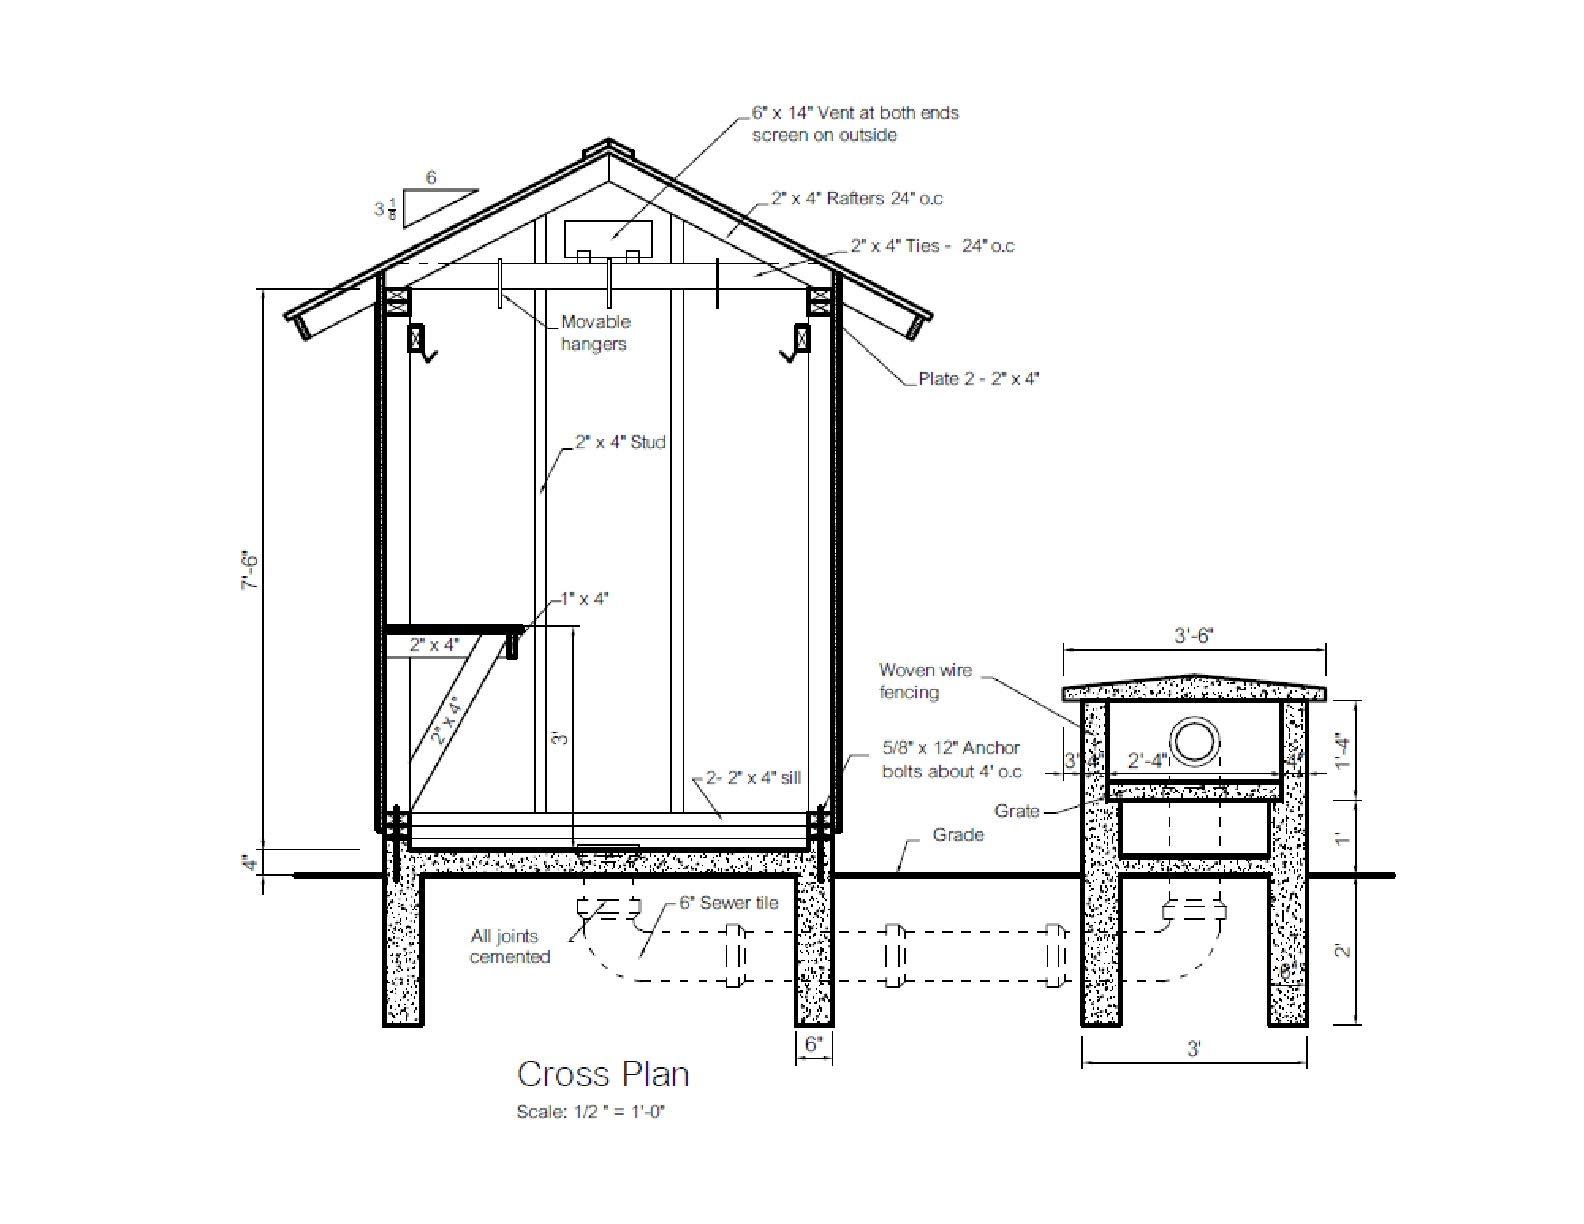 Smokehouse Plans 8' x 6' Smoker Smoke House Building Plan Build Your Own DIY by DIY Plans (Image #4)